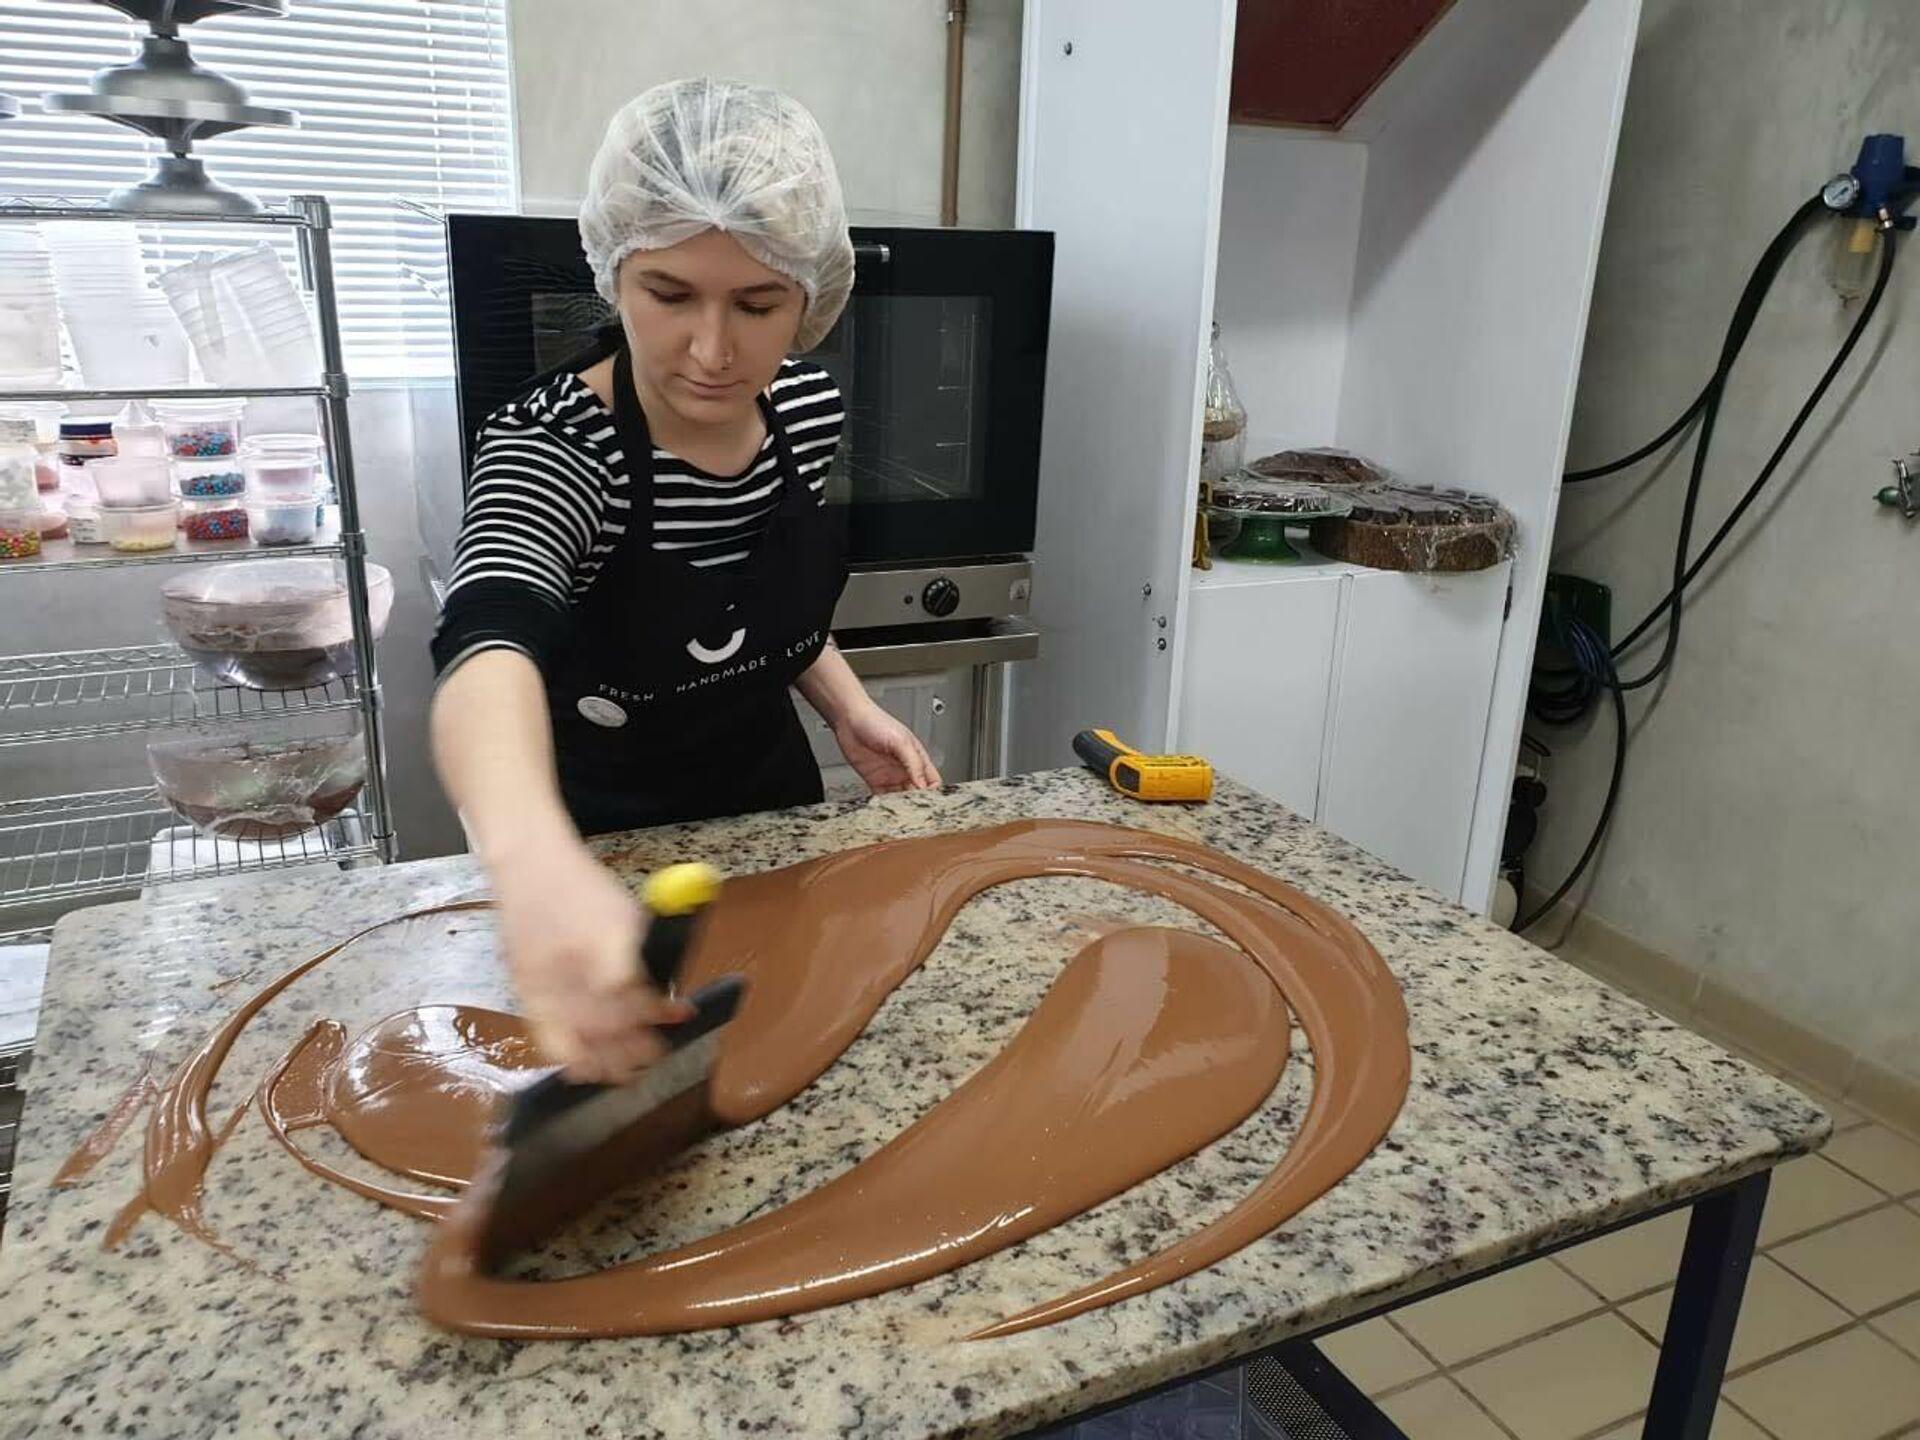 Raisa Coppola fabrica pasteles Medovik - Sputnik Mundo, 1920, 10.08.2021